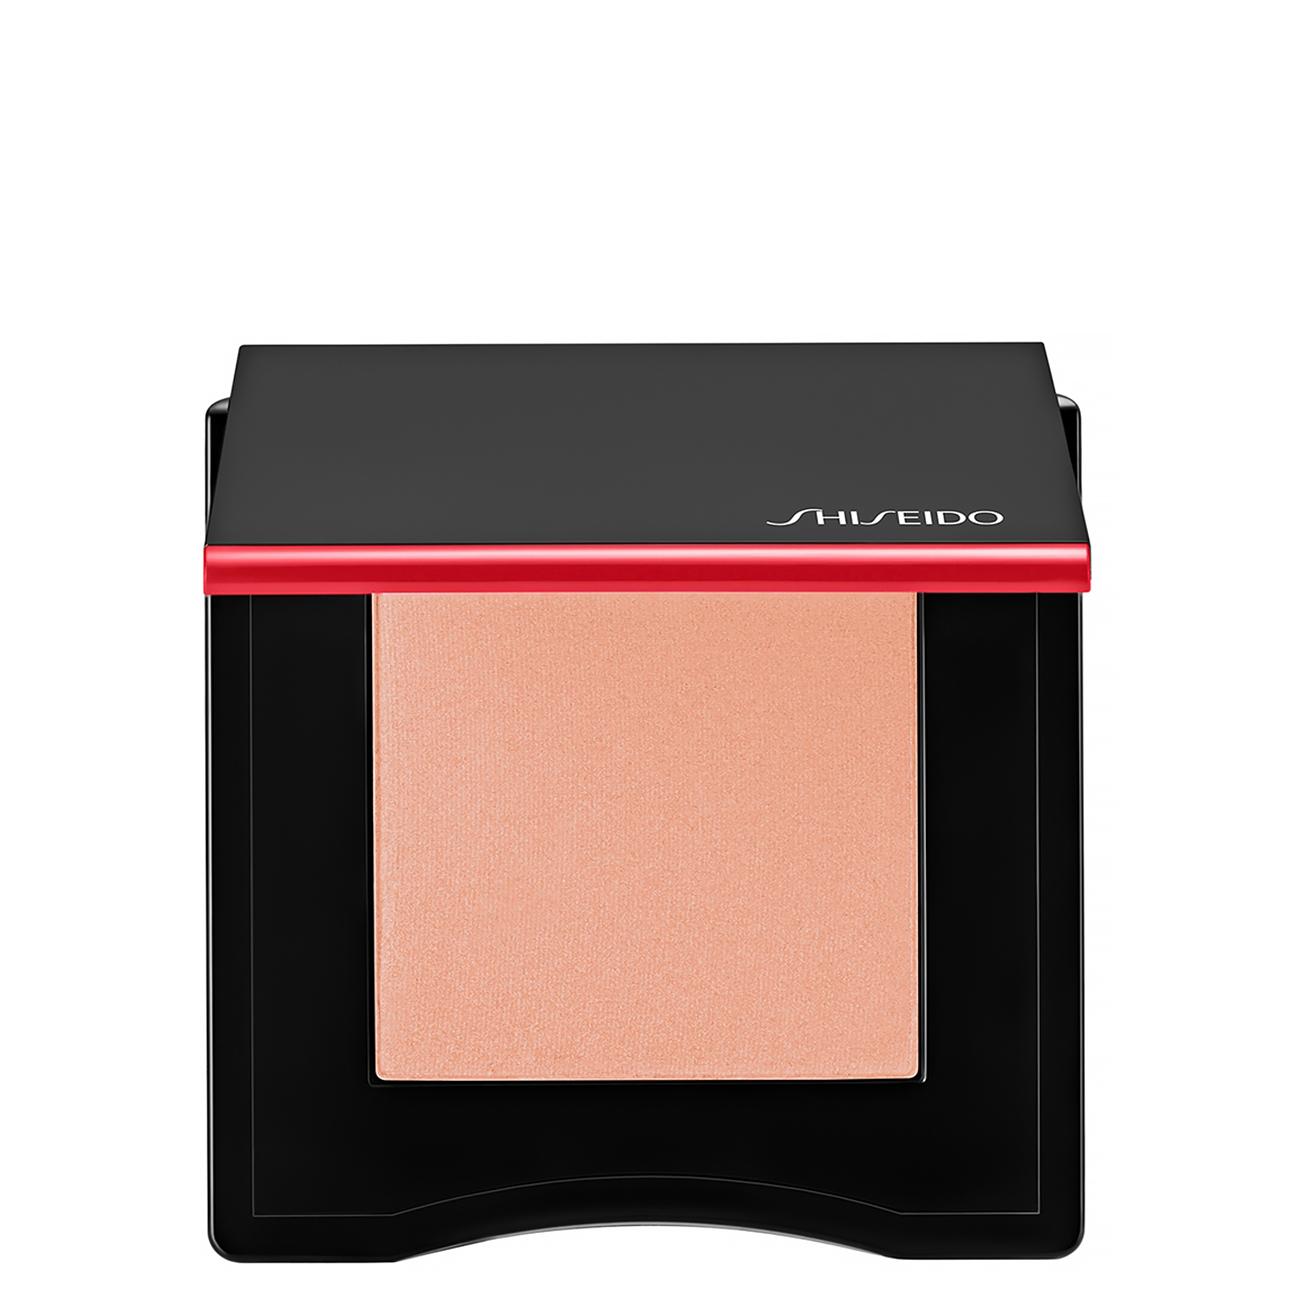 Innerglow Cheek Powder 06 3.5gr Shiseido imagine 2021 bestvalue.eu